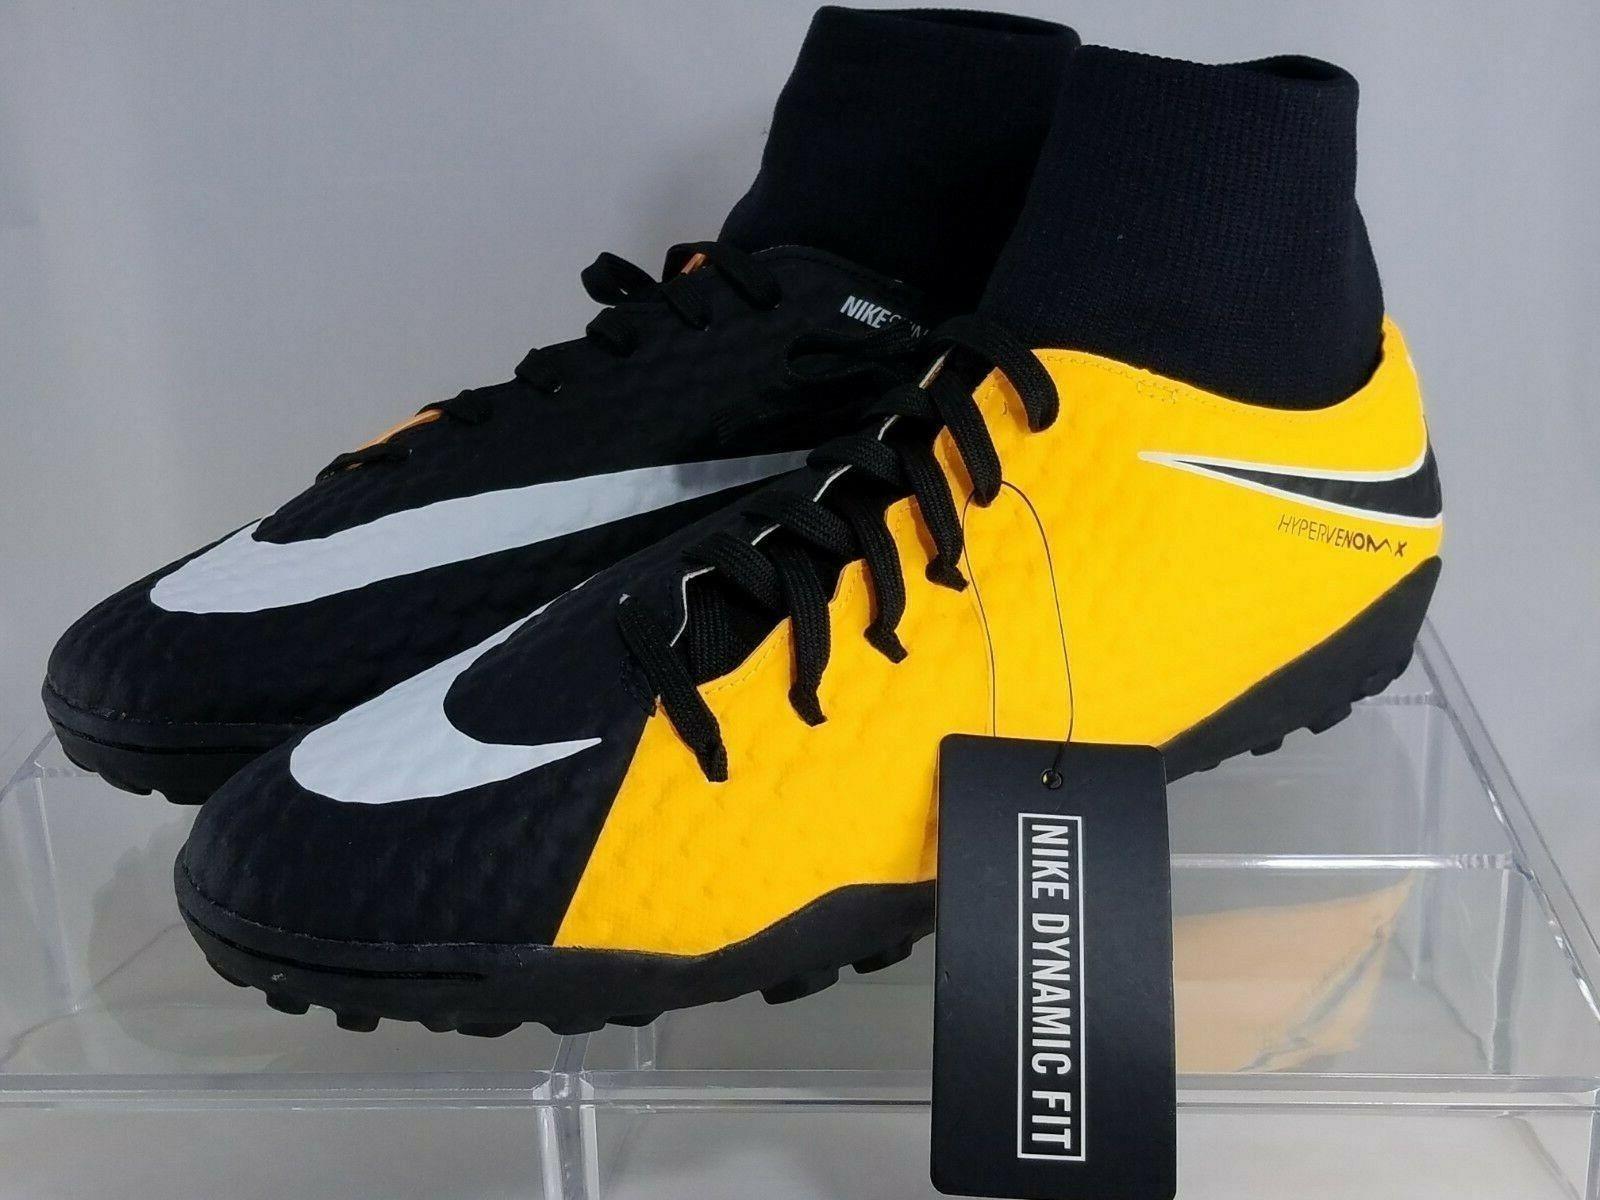 NIKE HyperVenom Phelon 3 DF TF orange Indoor Soccer shoes Size 10.5 917769-801